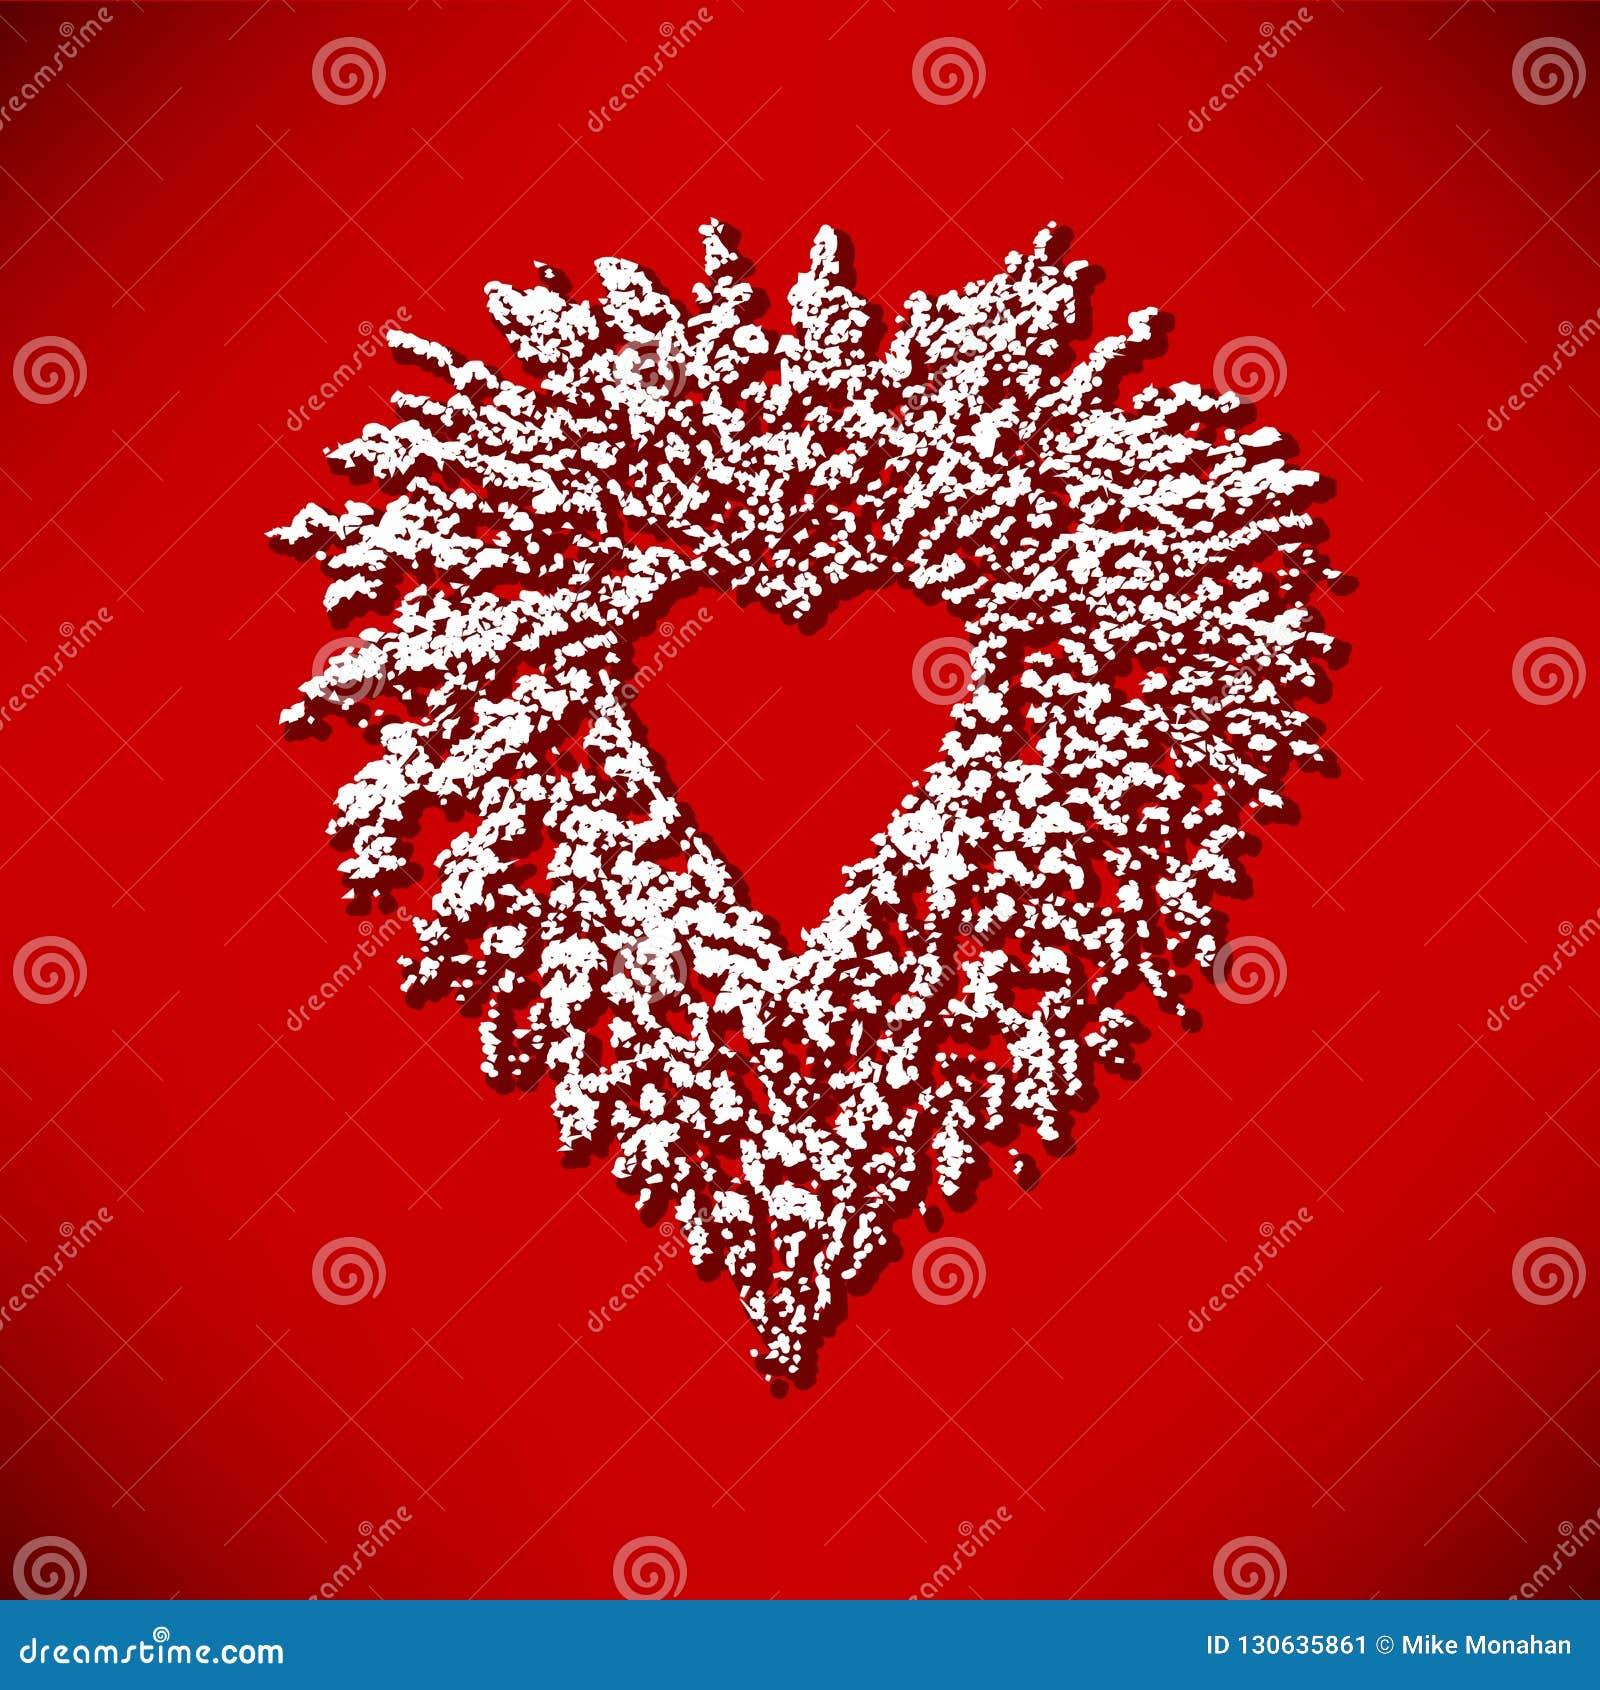 Christmas Heart Wreath.Christmas Heart Wreath Graphic Stock Vector Illustration